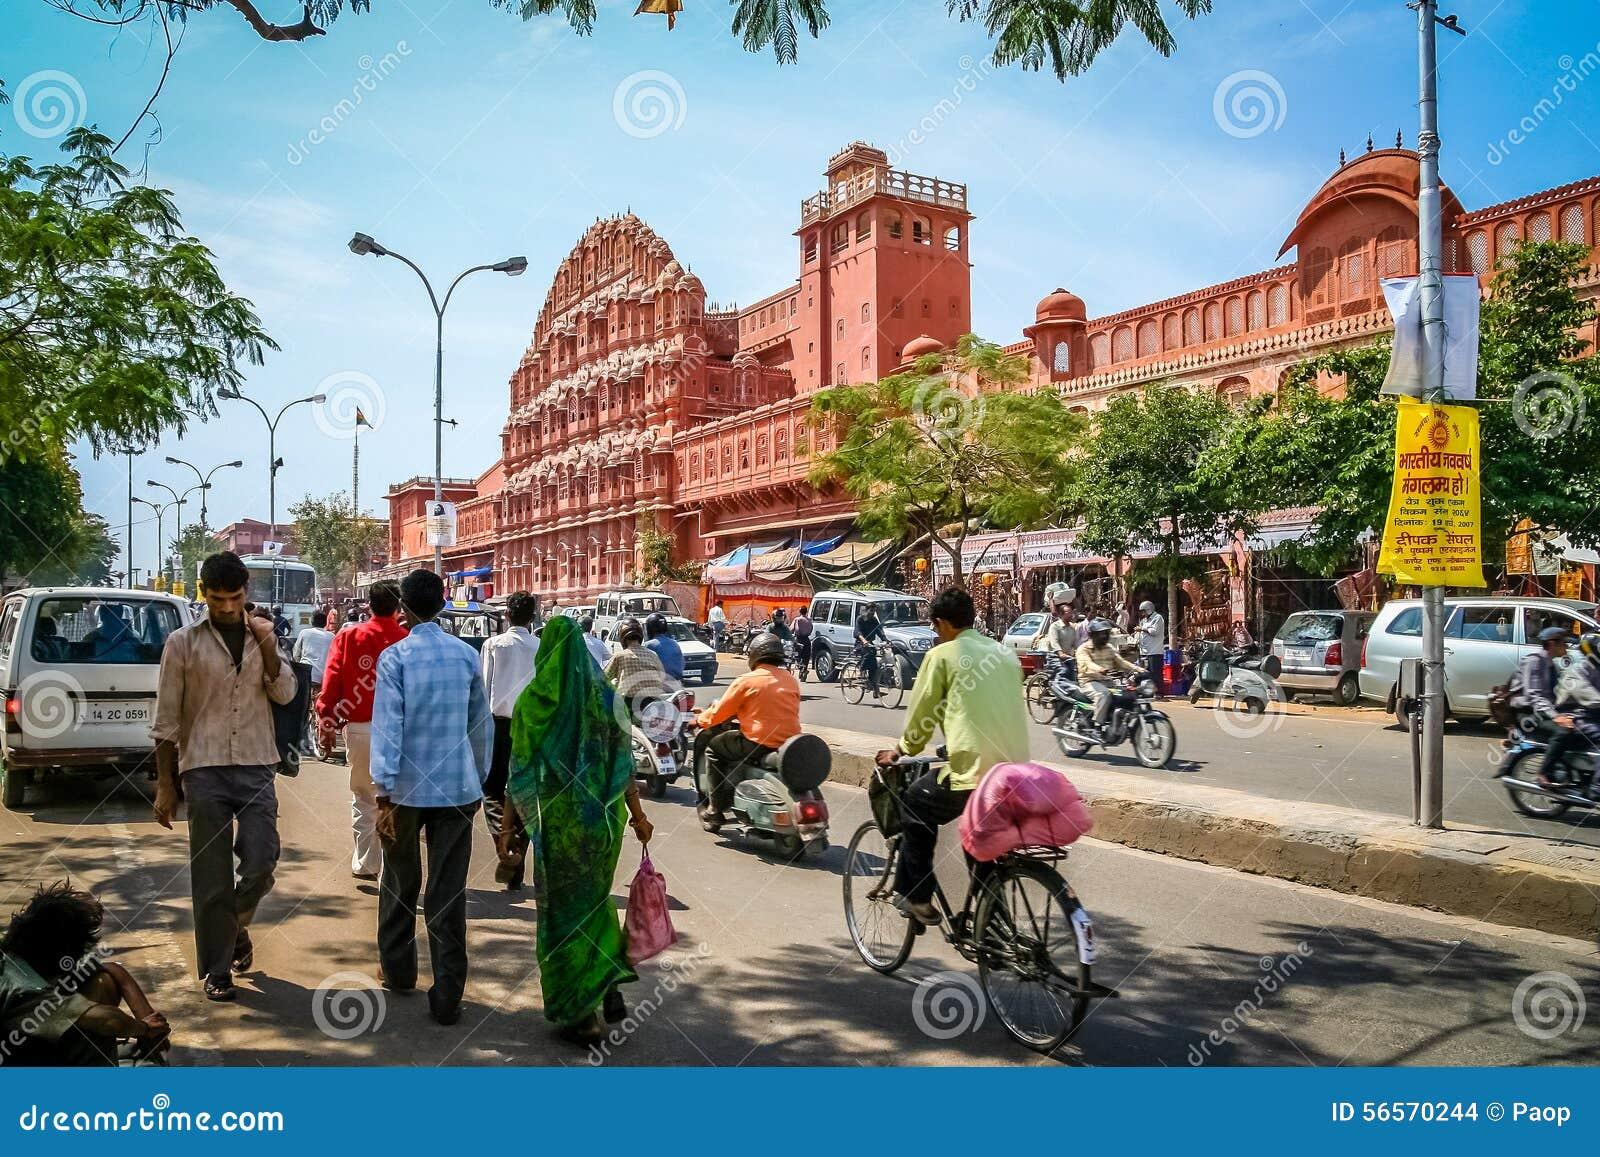 Download Πολυάσχολος μπροστά από Hawa Mahal Εκδοτική Στοκ Εικόνα - εικόνα από πόλη, ασιατικοί: 56570244